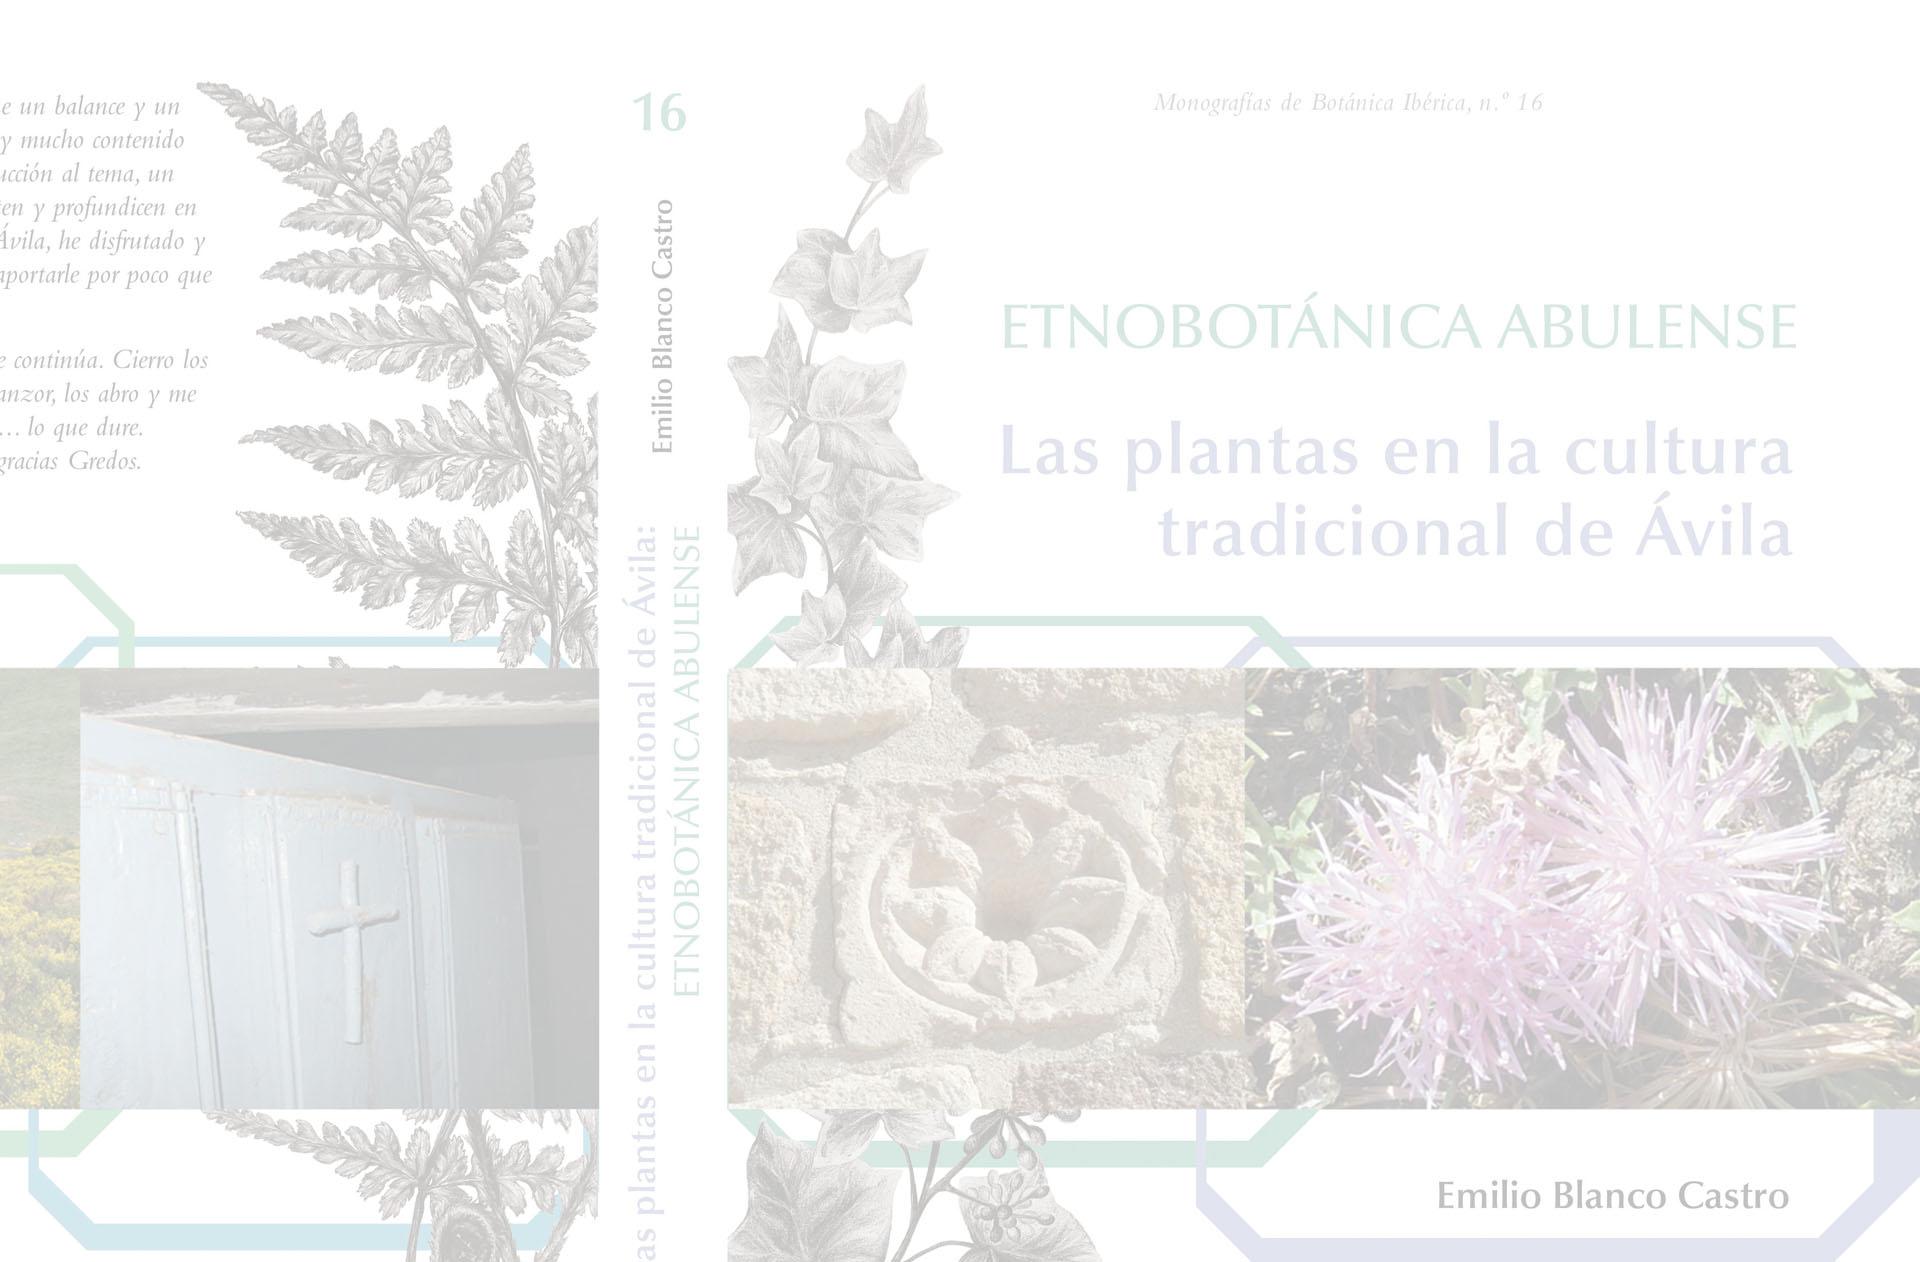 Etnobotanica-abulense-Las-plantas-en-la-cultura-tradicional-de-Avila_Emilio Blanco_sirem_2